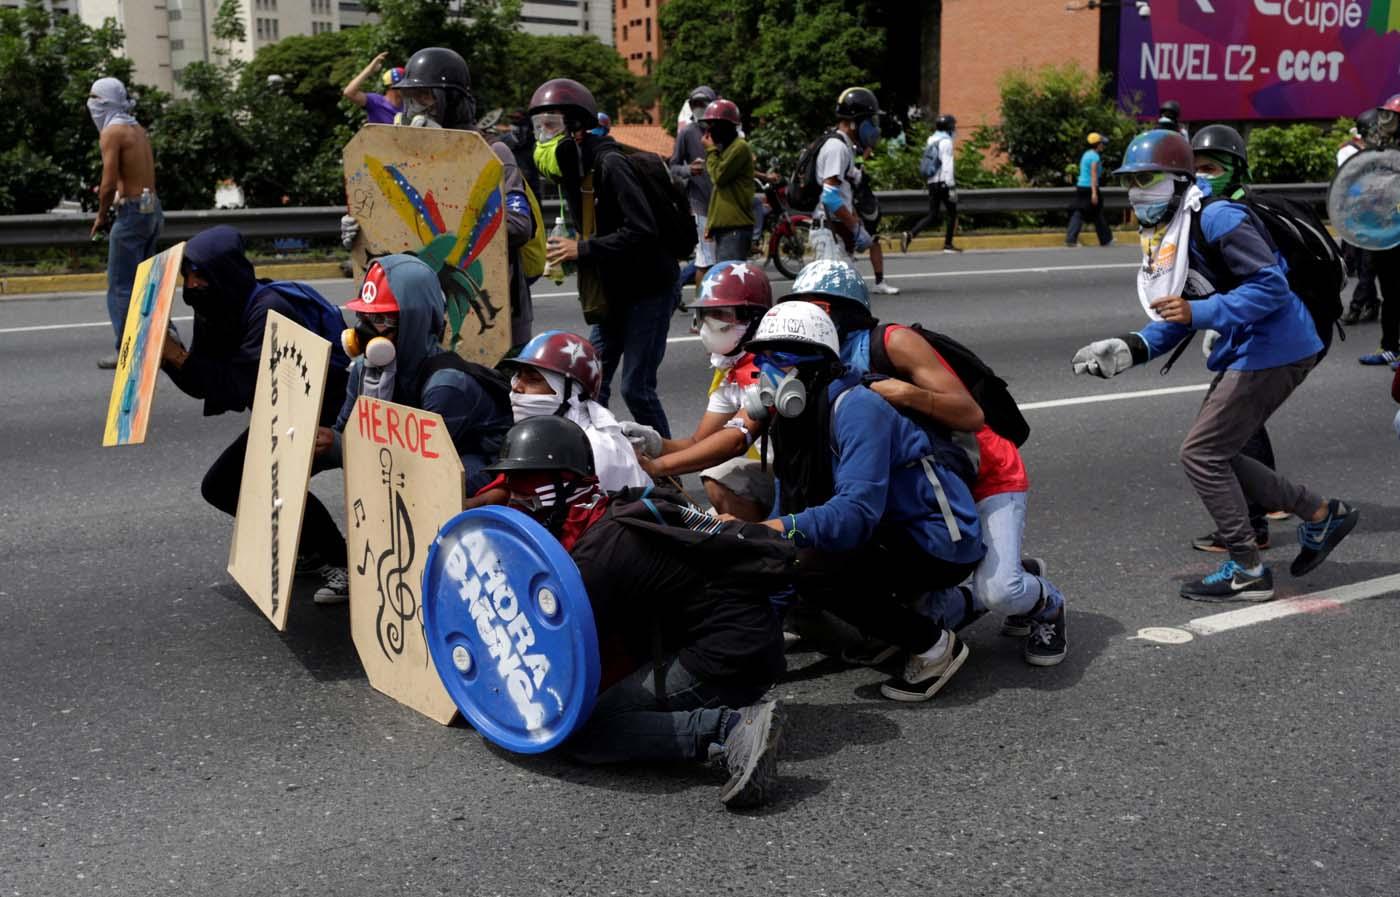 2017-05-24T221342Z_136943933_RC1E95798DF0_RTRMADP_3_VENEZUELA-POLITICS.x43795.jpg